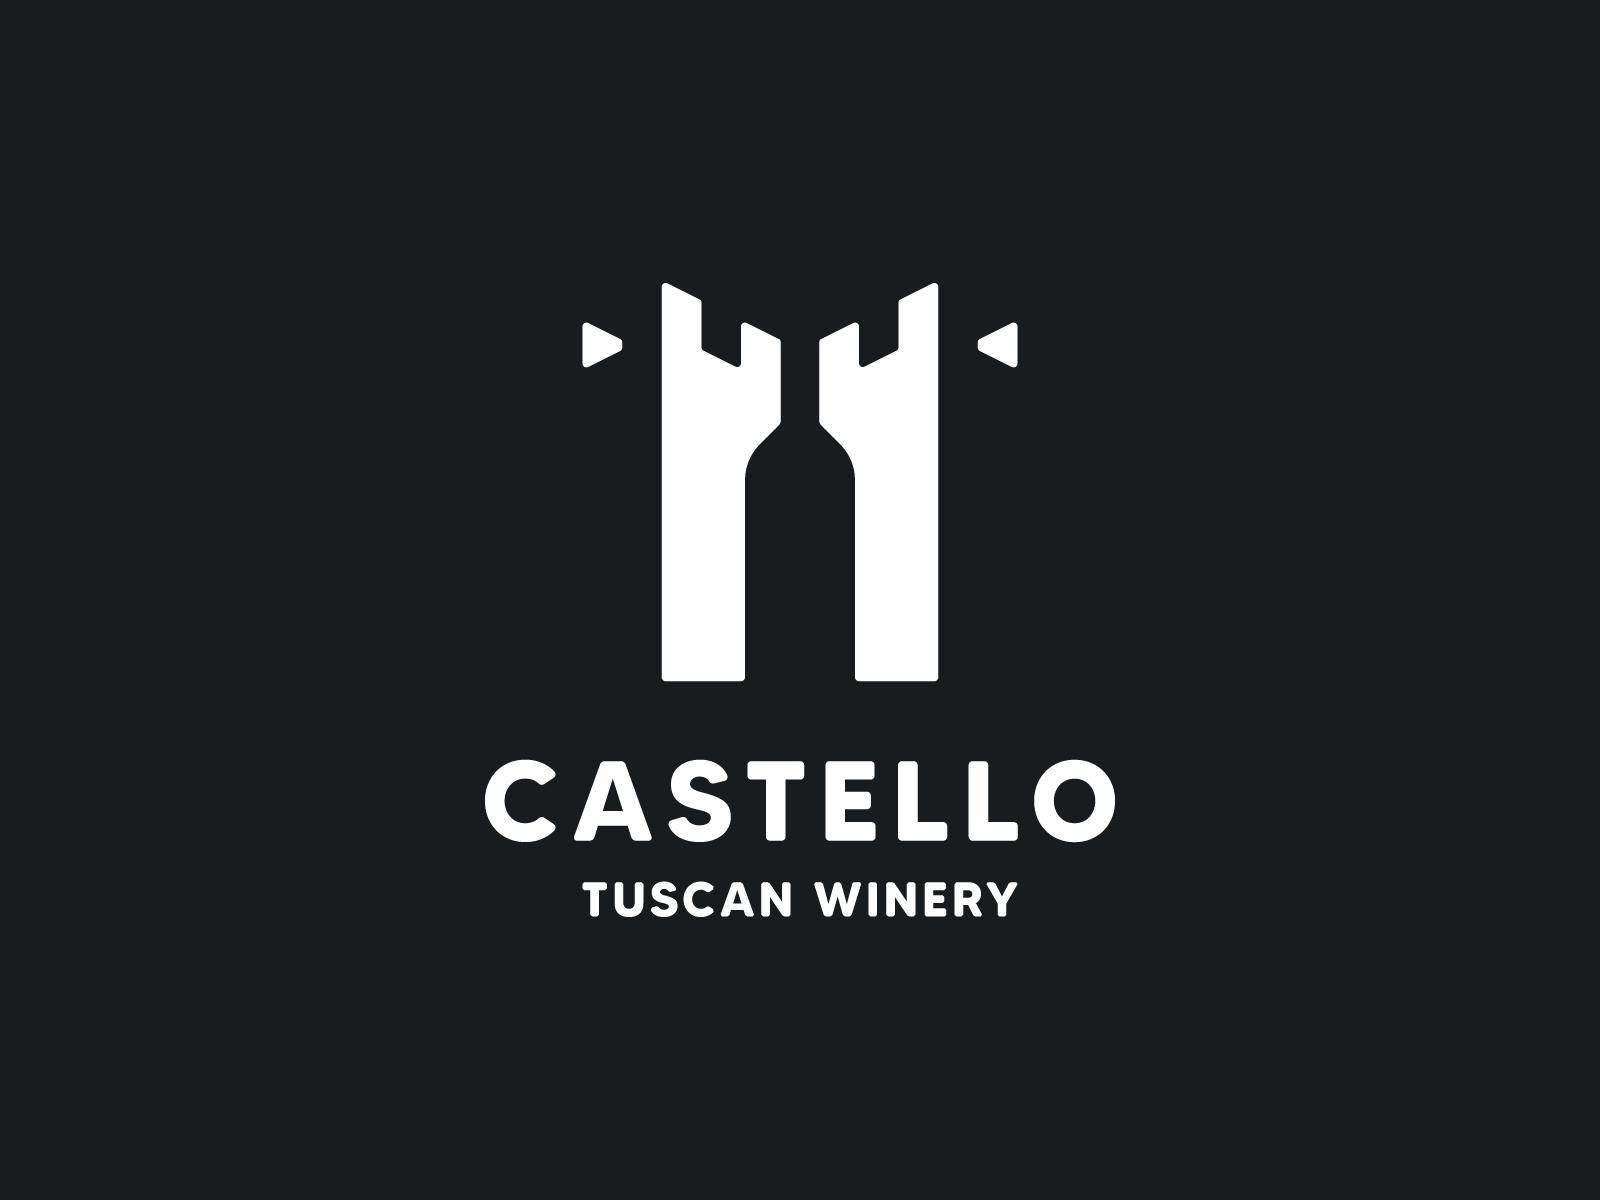 Castello Tuscan winery